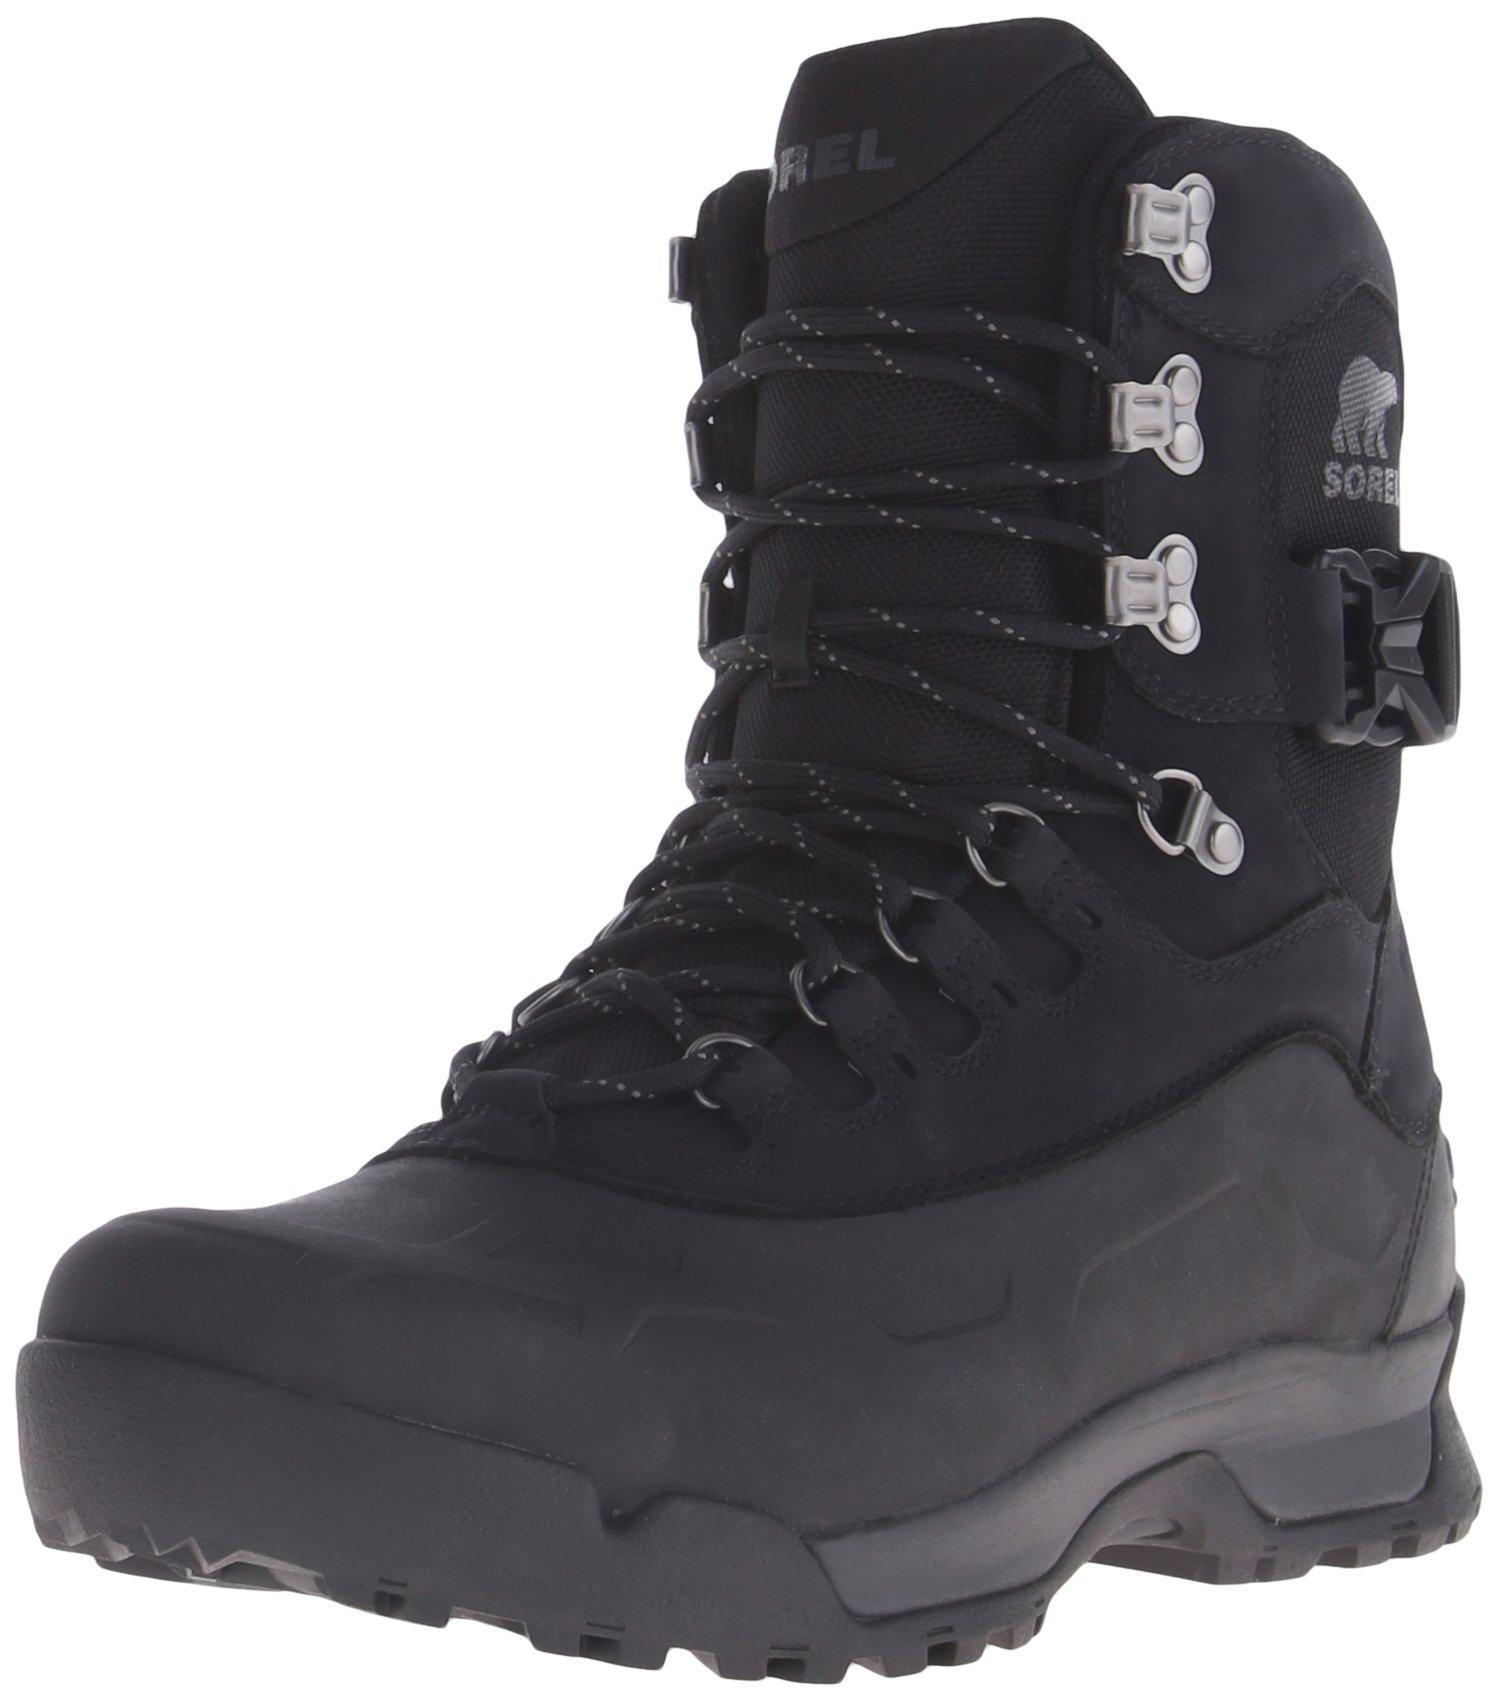 Sorel Men's Paxson Tall Waterproof Snow Boot, Black, Shark, 15 D US